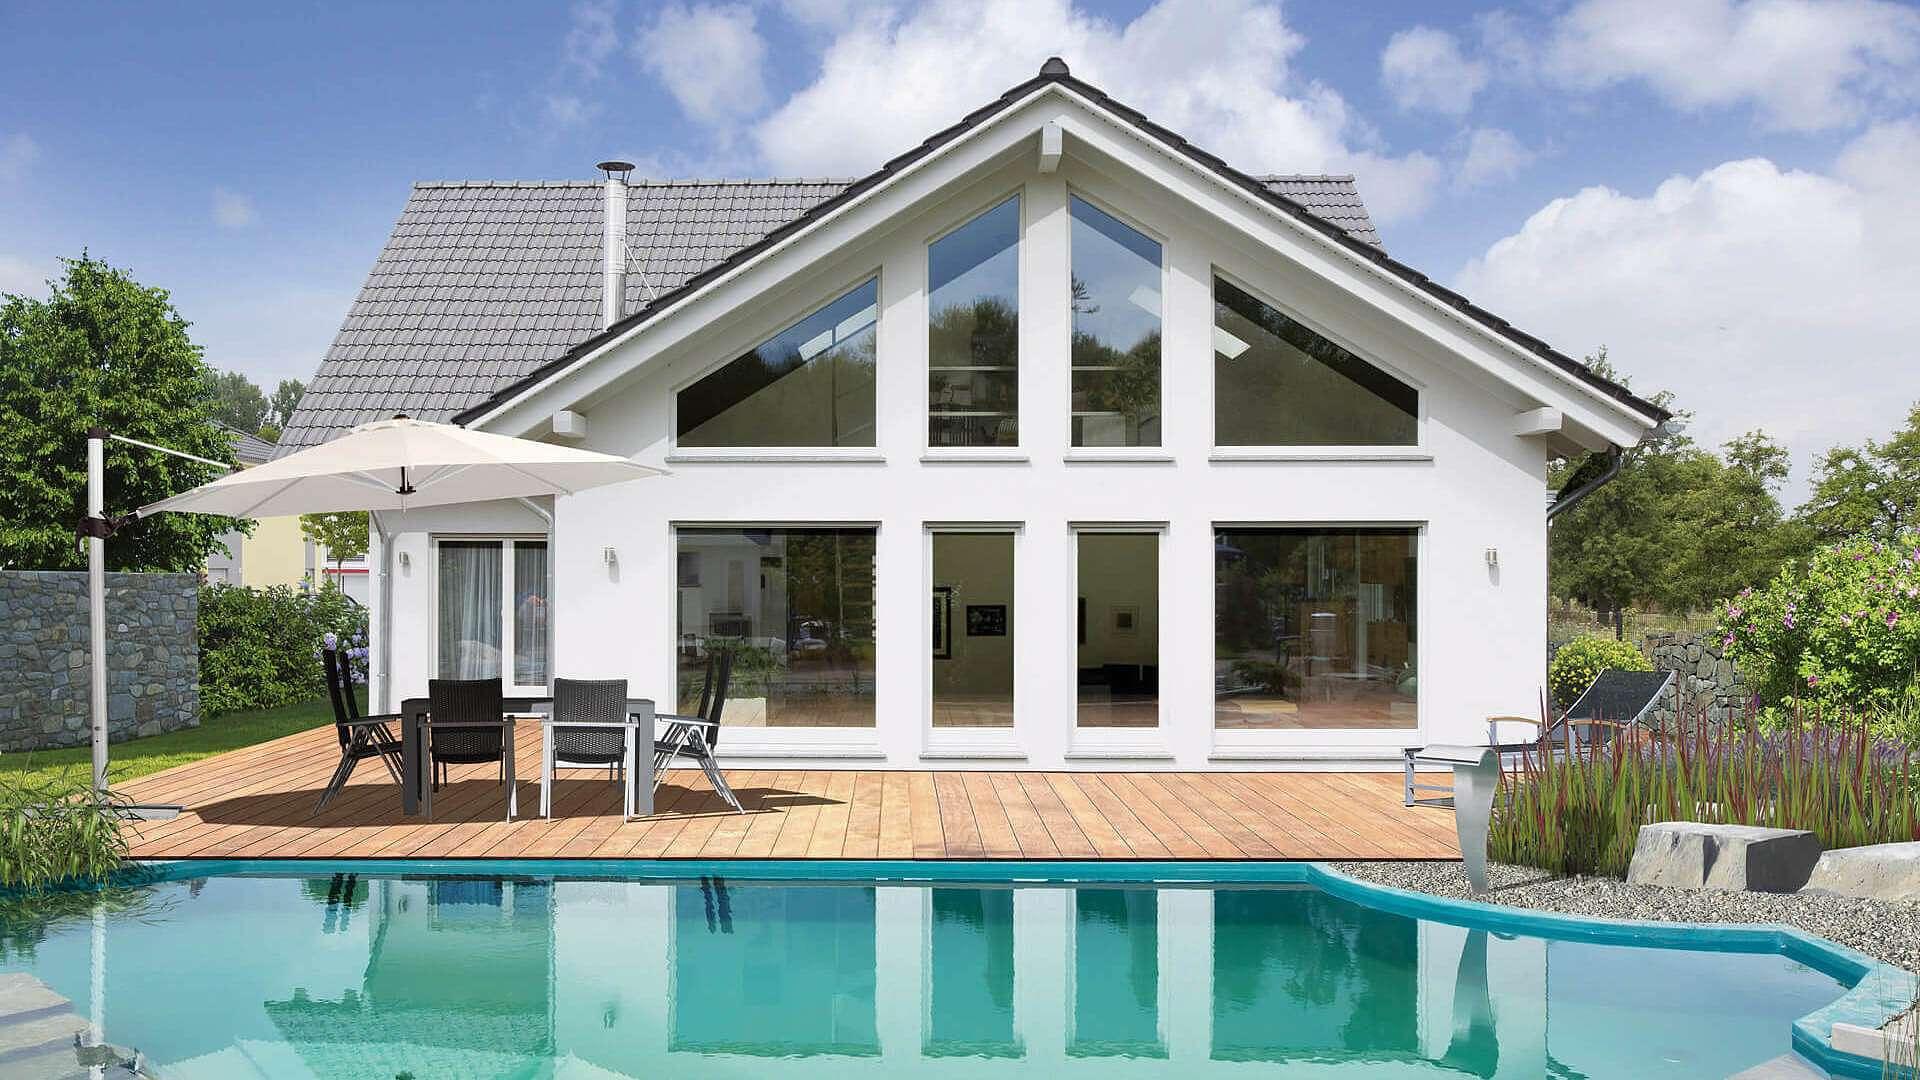 fingerhut haus l fingerhut haus anbieter. Black Bedroom Furniture Sets. Home Design Ideas